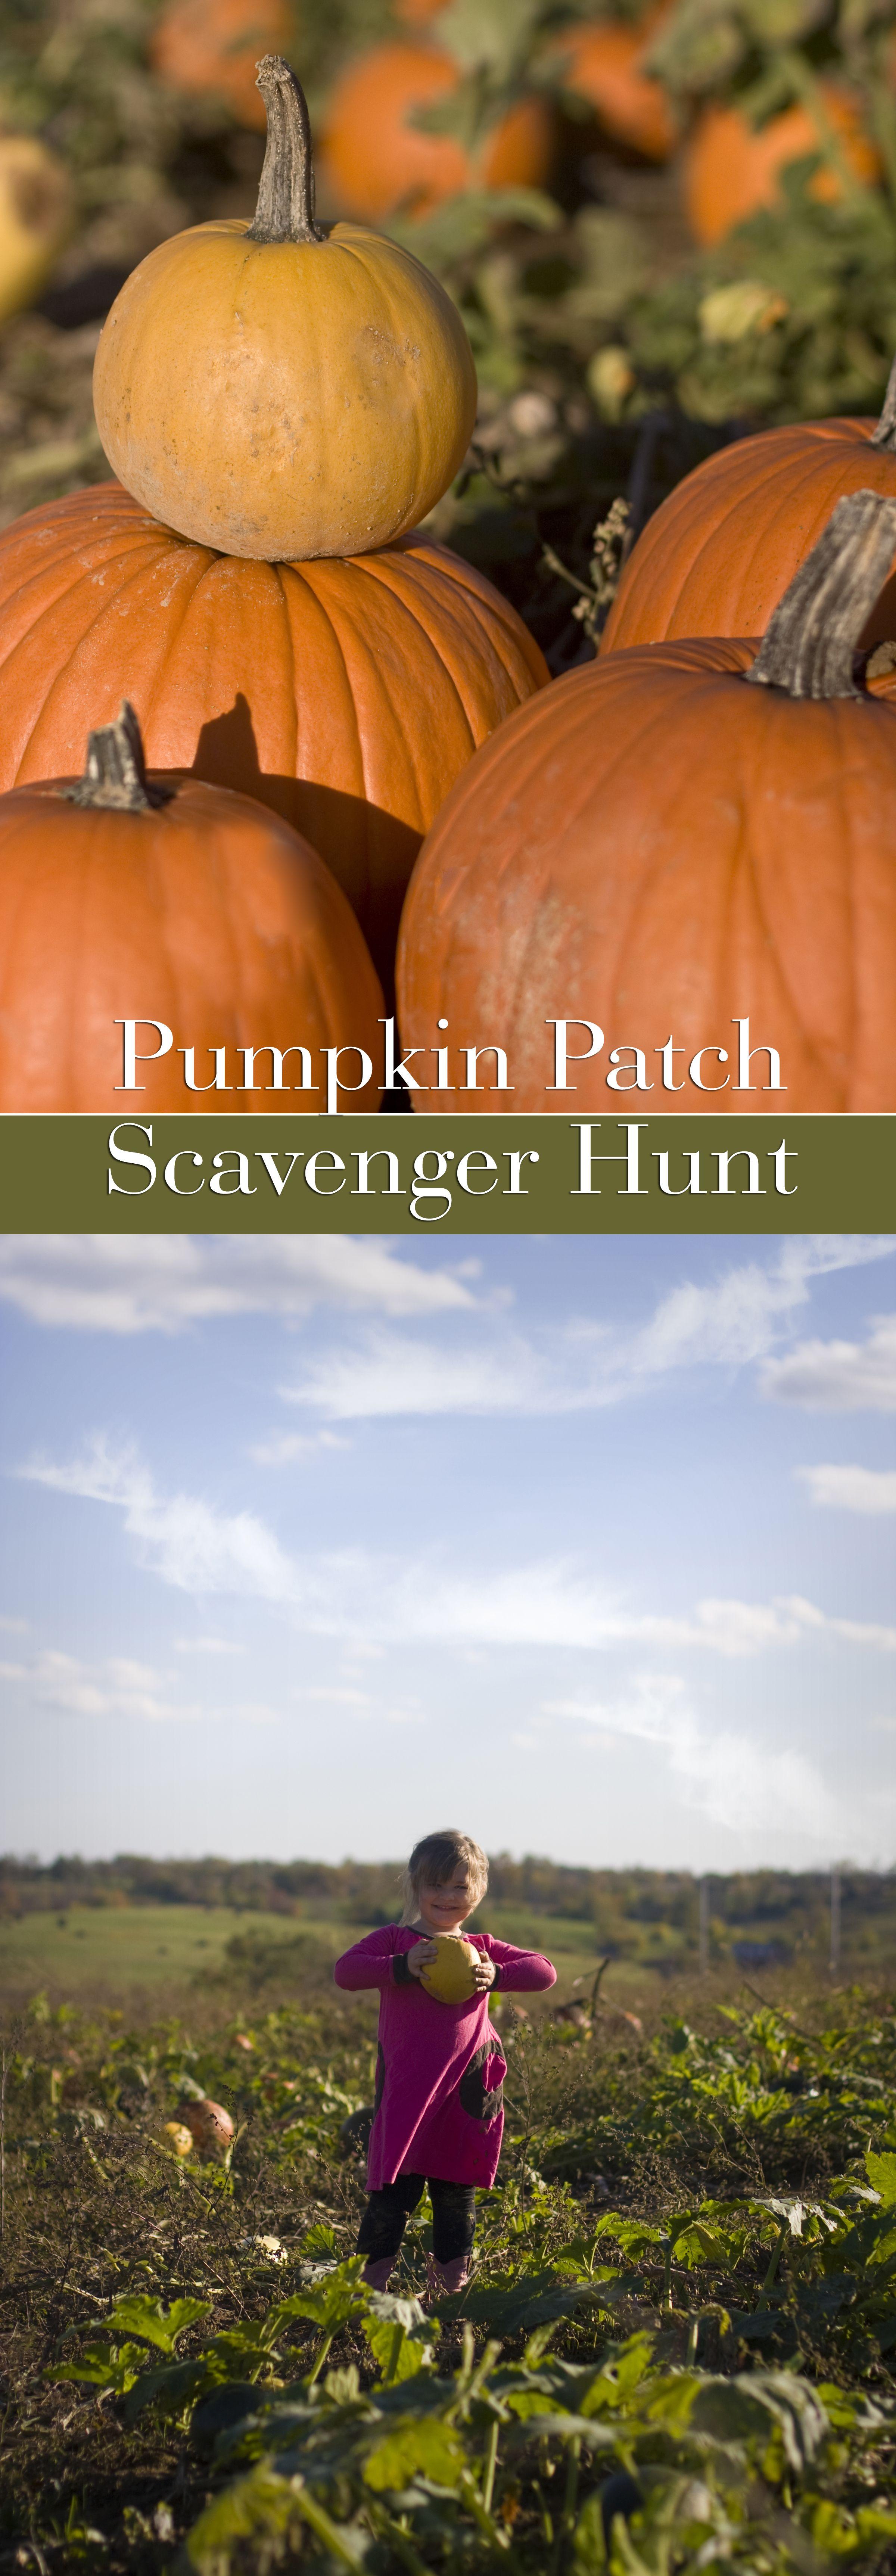 Such a Fun Pumpkin Patch Scavenger Hunt